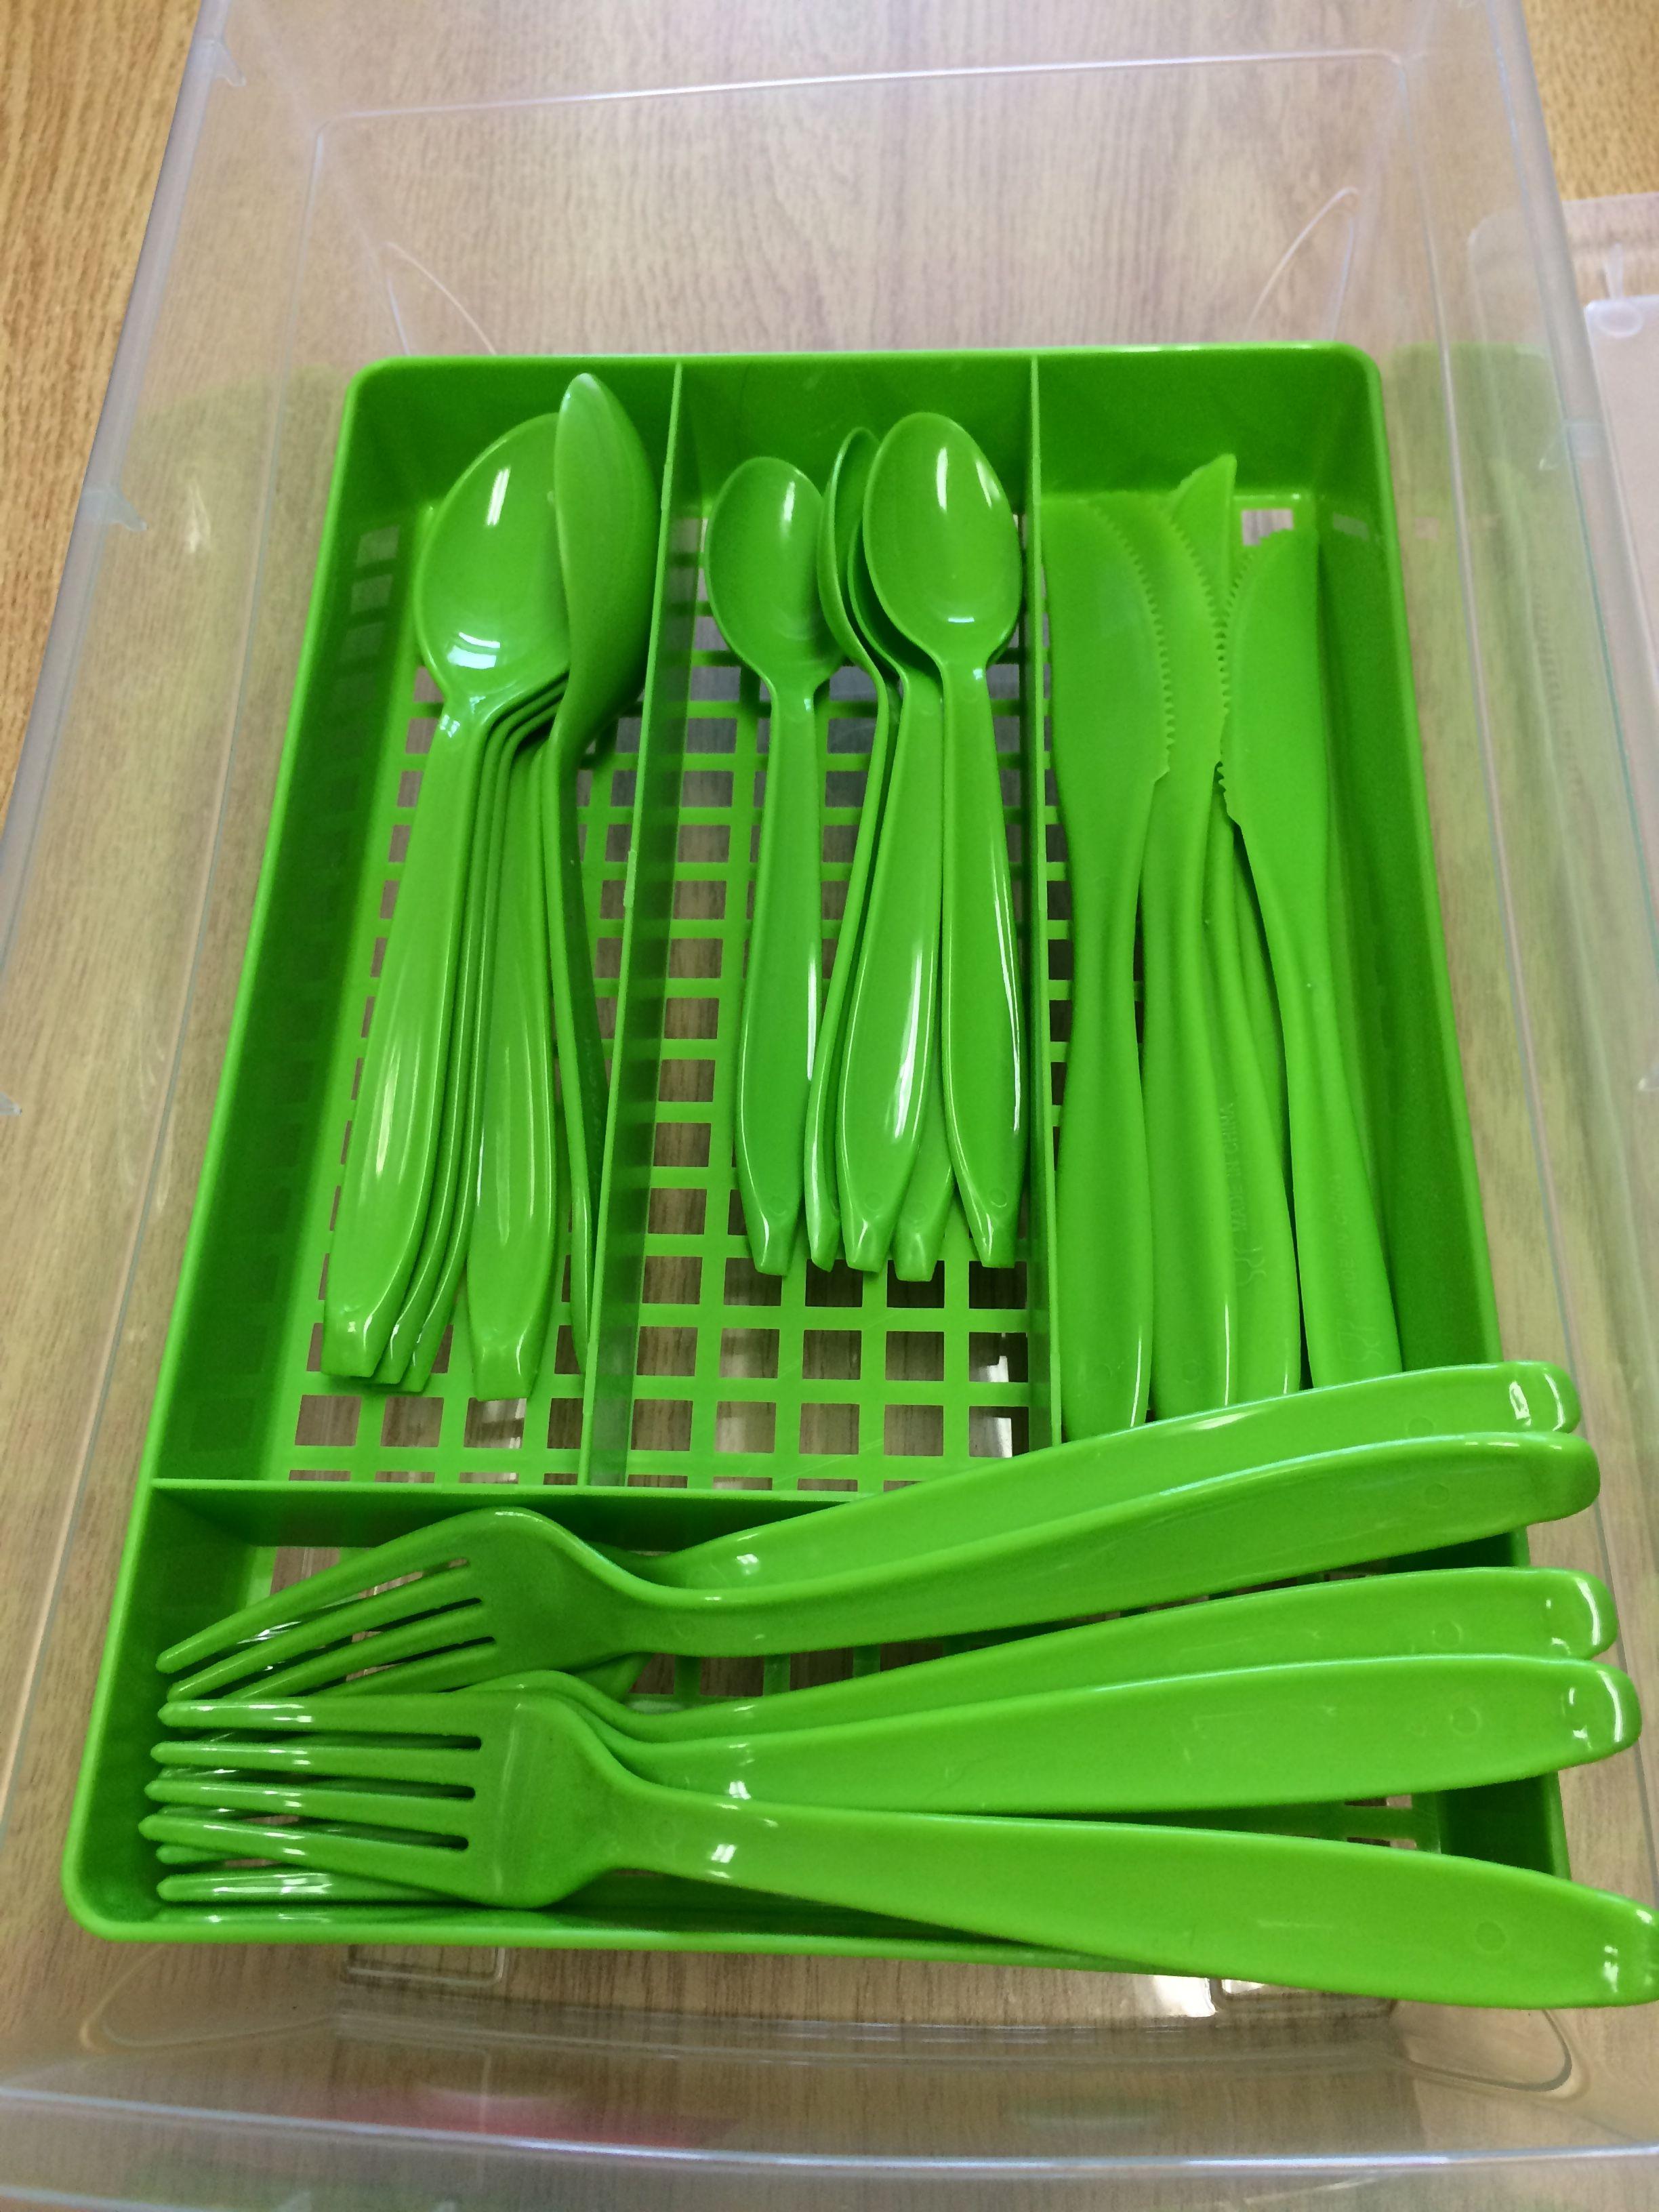 Sorting Cutlery Work Task From Dollarama